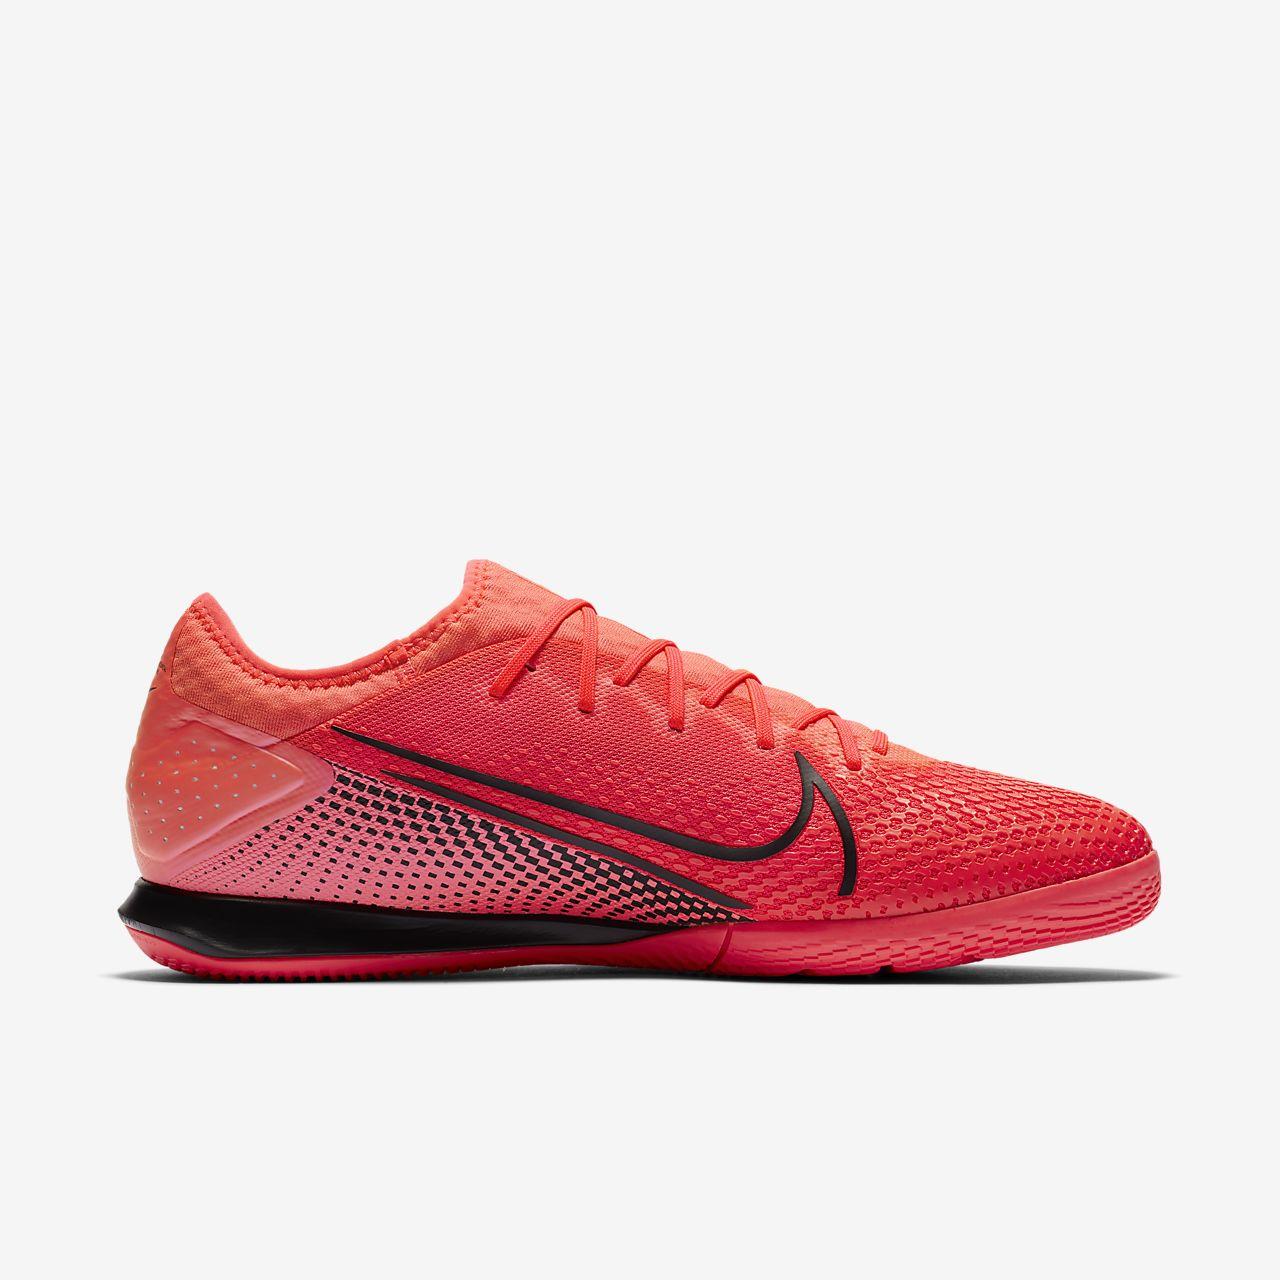 Nike Mercurial Vapor 13 Pro IC IndoorCourt Football Shoe